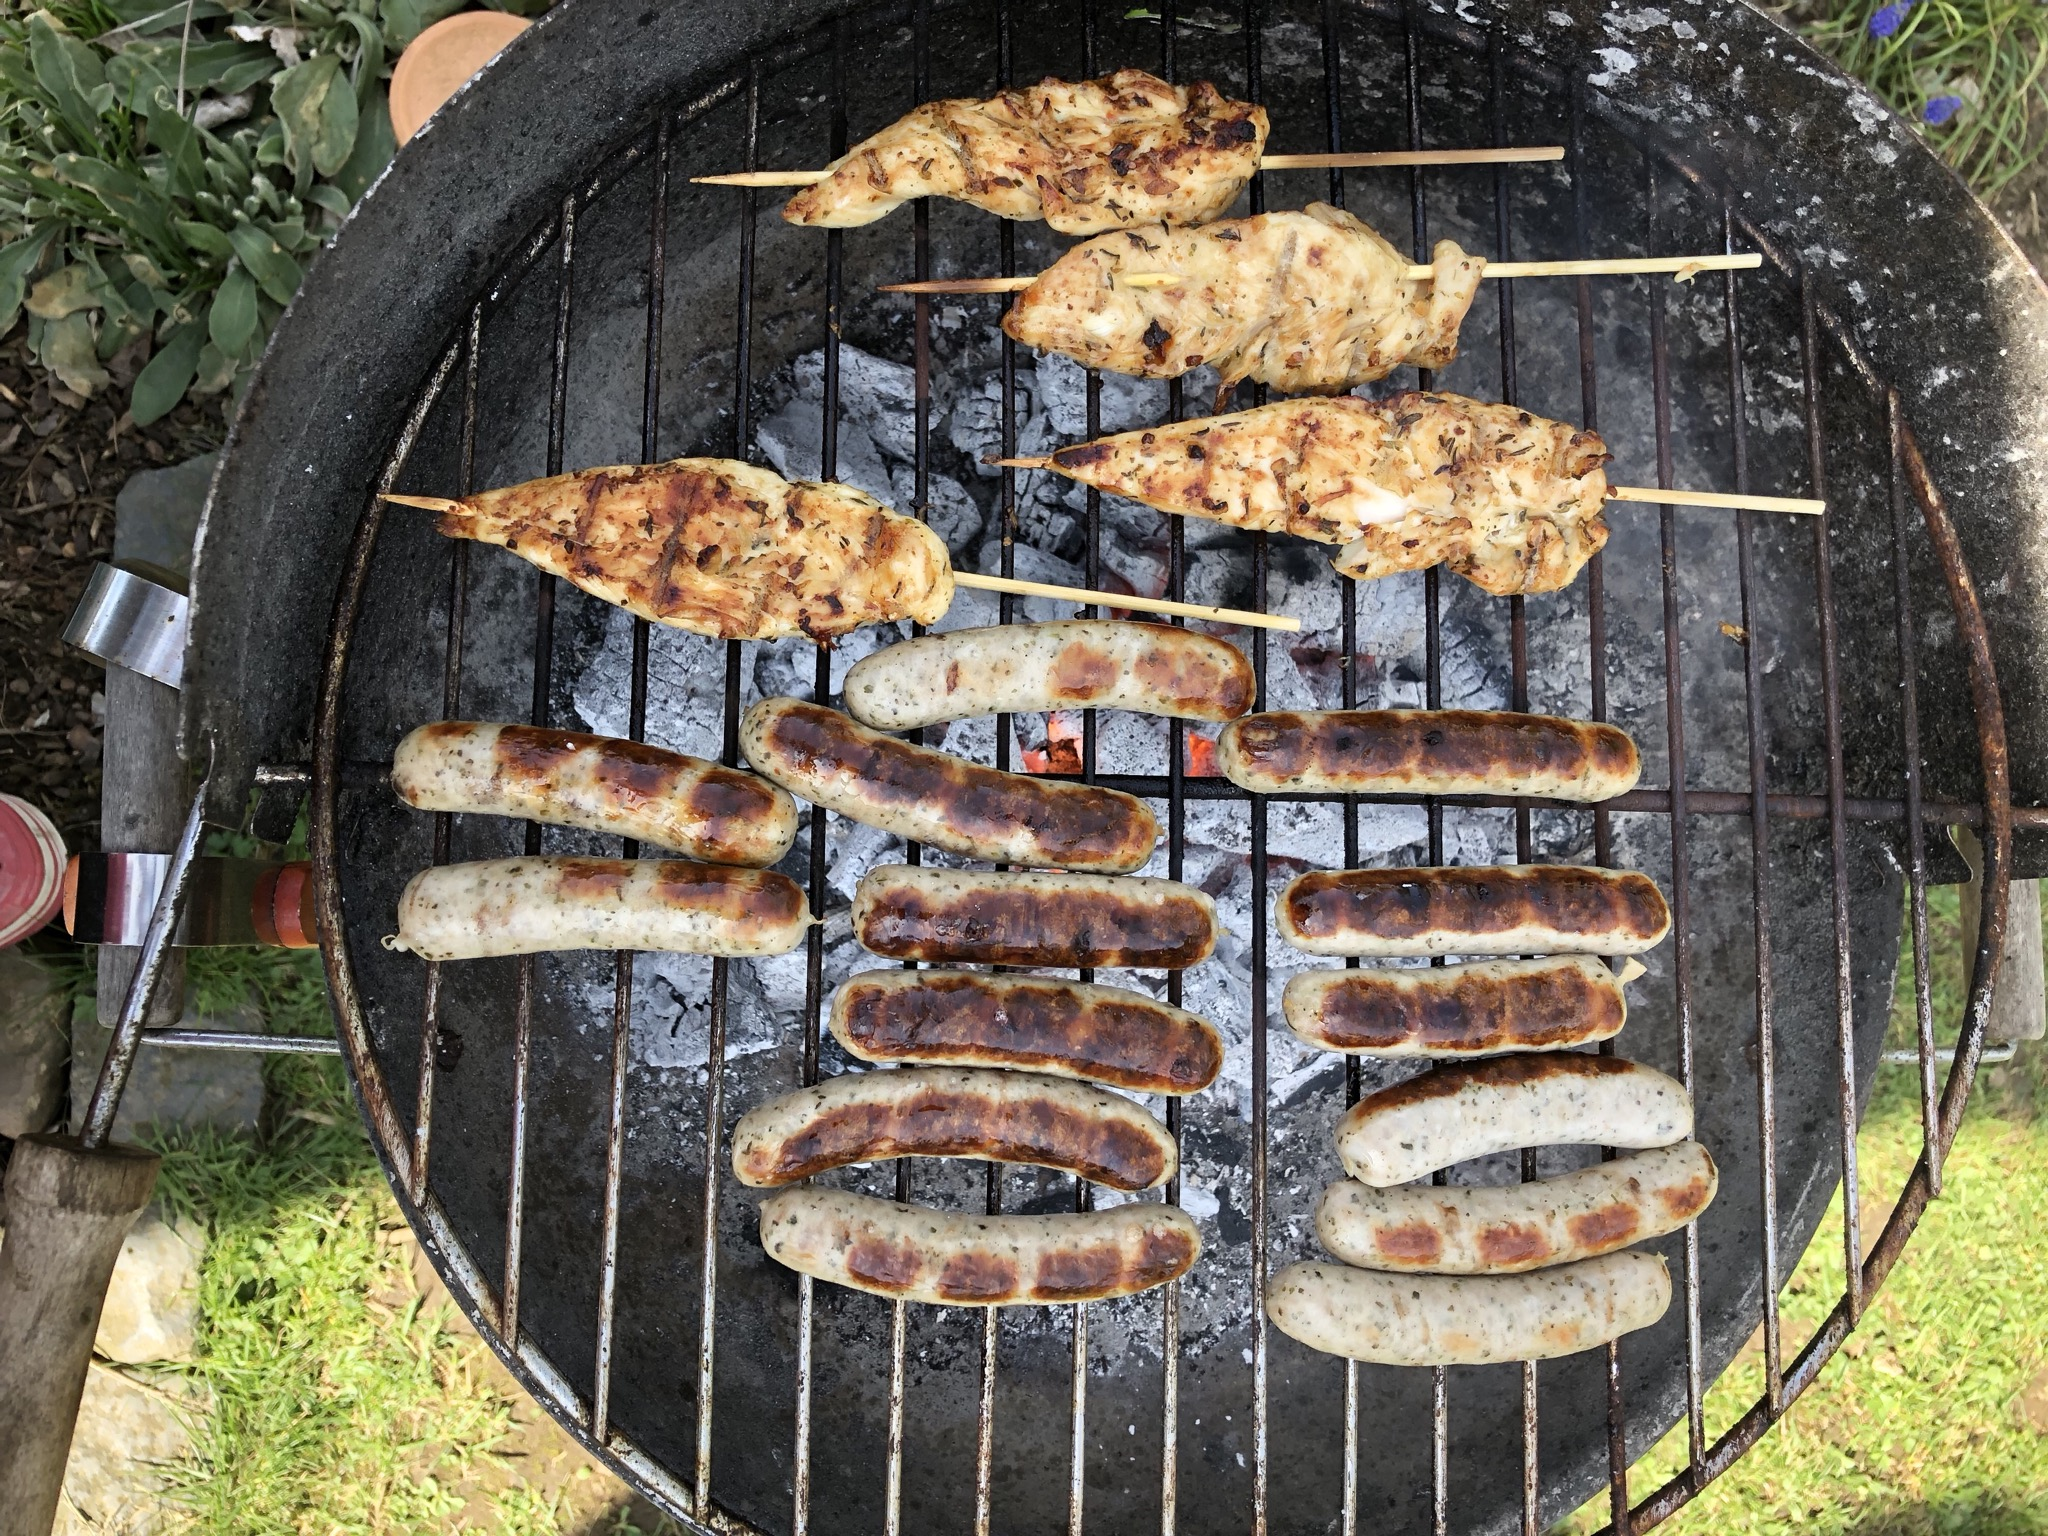 Outdoorküche Bausatz Vergleich : Bausatz outdoor küche grill für outdoor küche küche spritzschutz